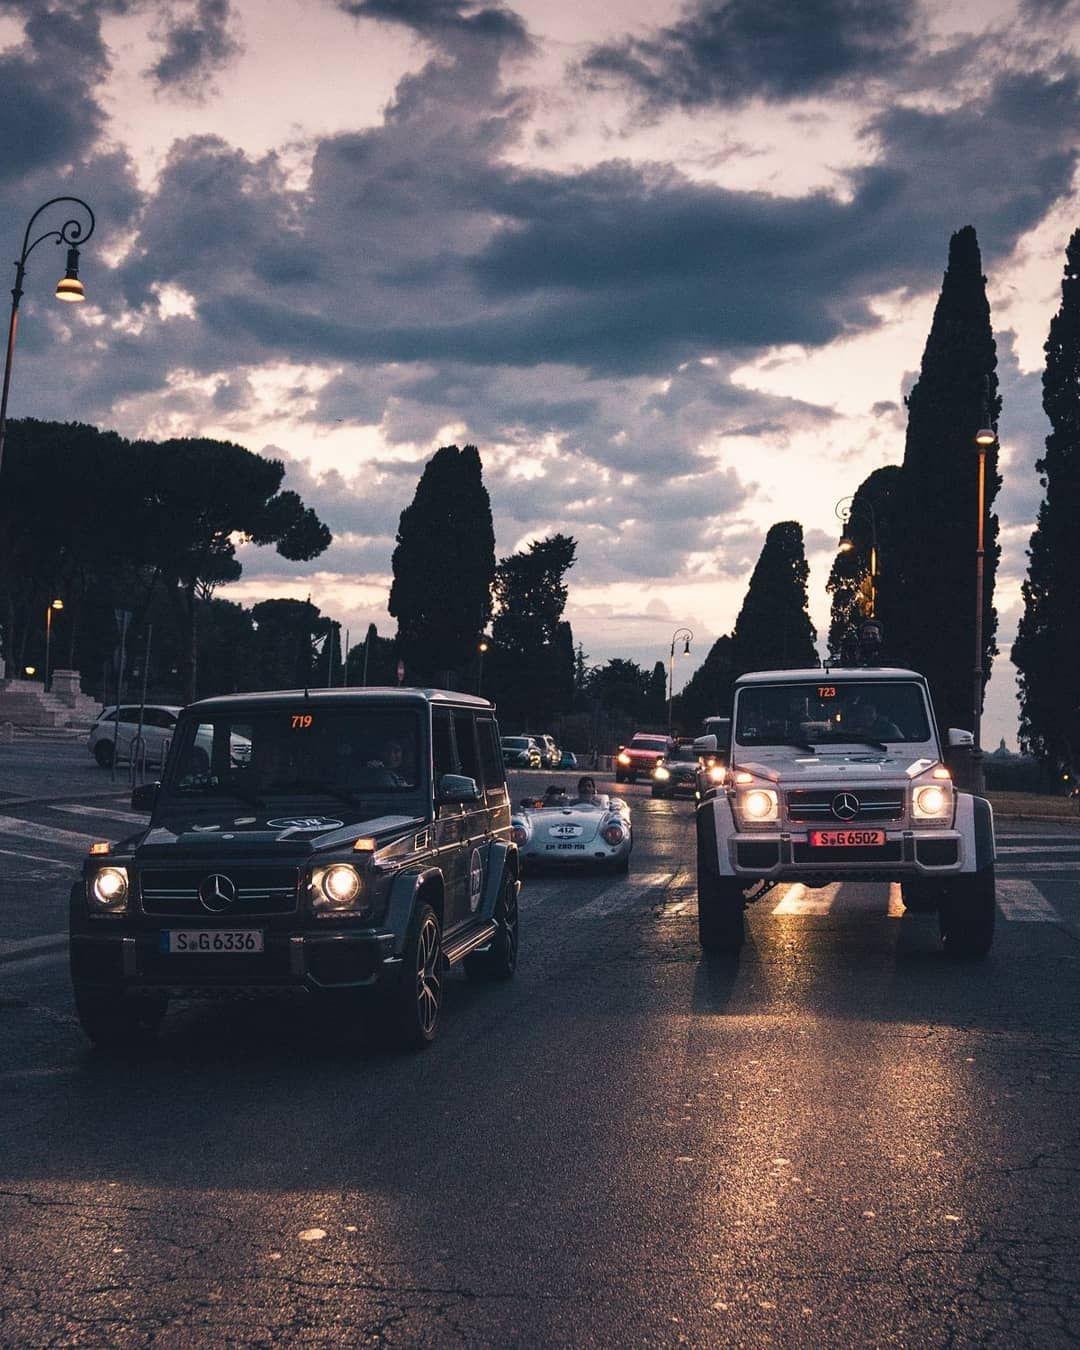 "////AMG_Mercedes-Benz on Instagram: ""#mercedes #mercedesbenz #amg #france #gclass #63amg #cars #luxury #luxurylifestyle #mercedesamg #mercedesbenzfr"""